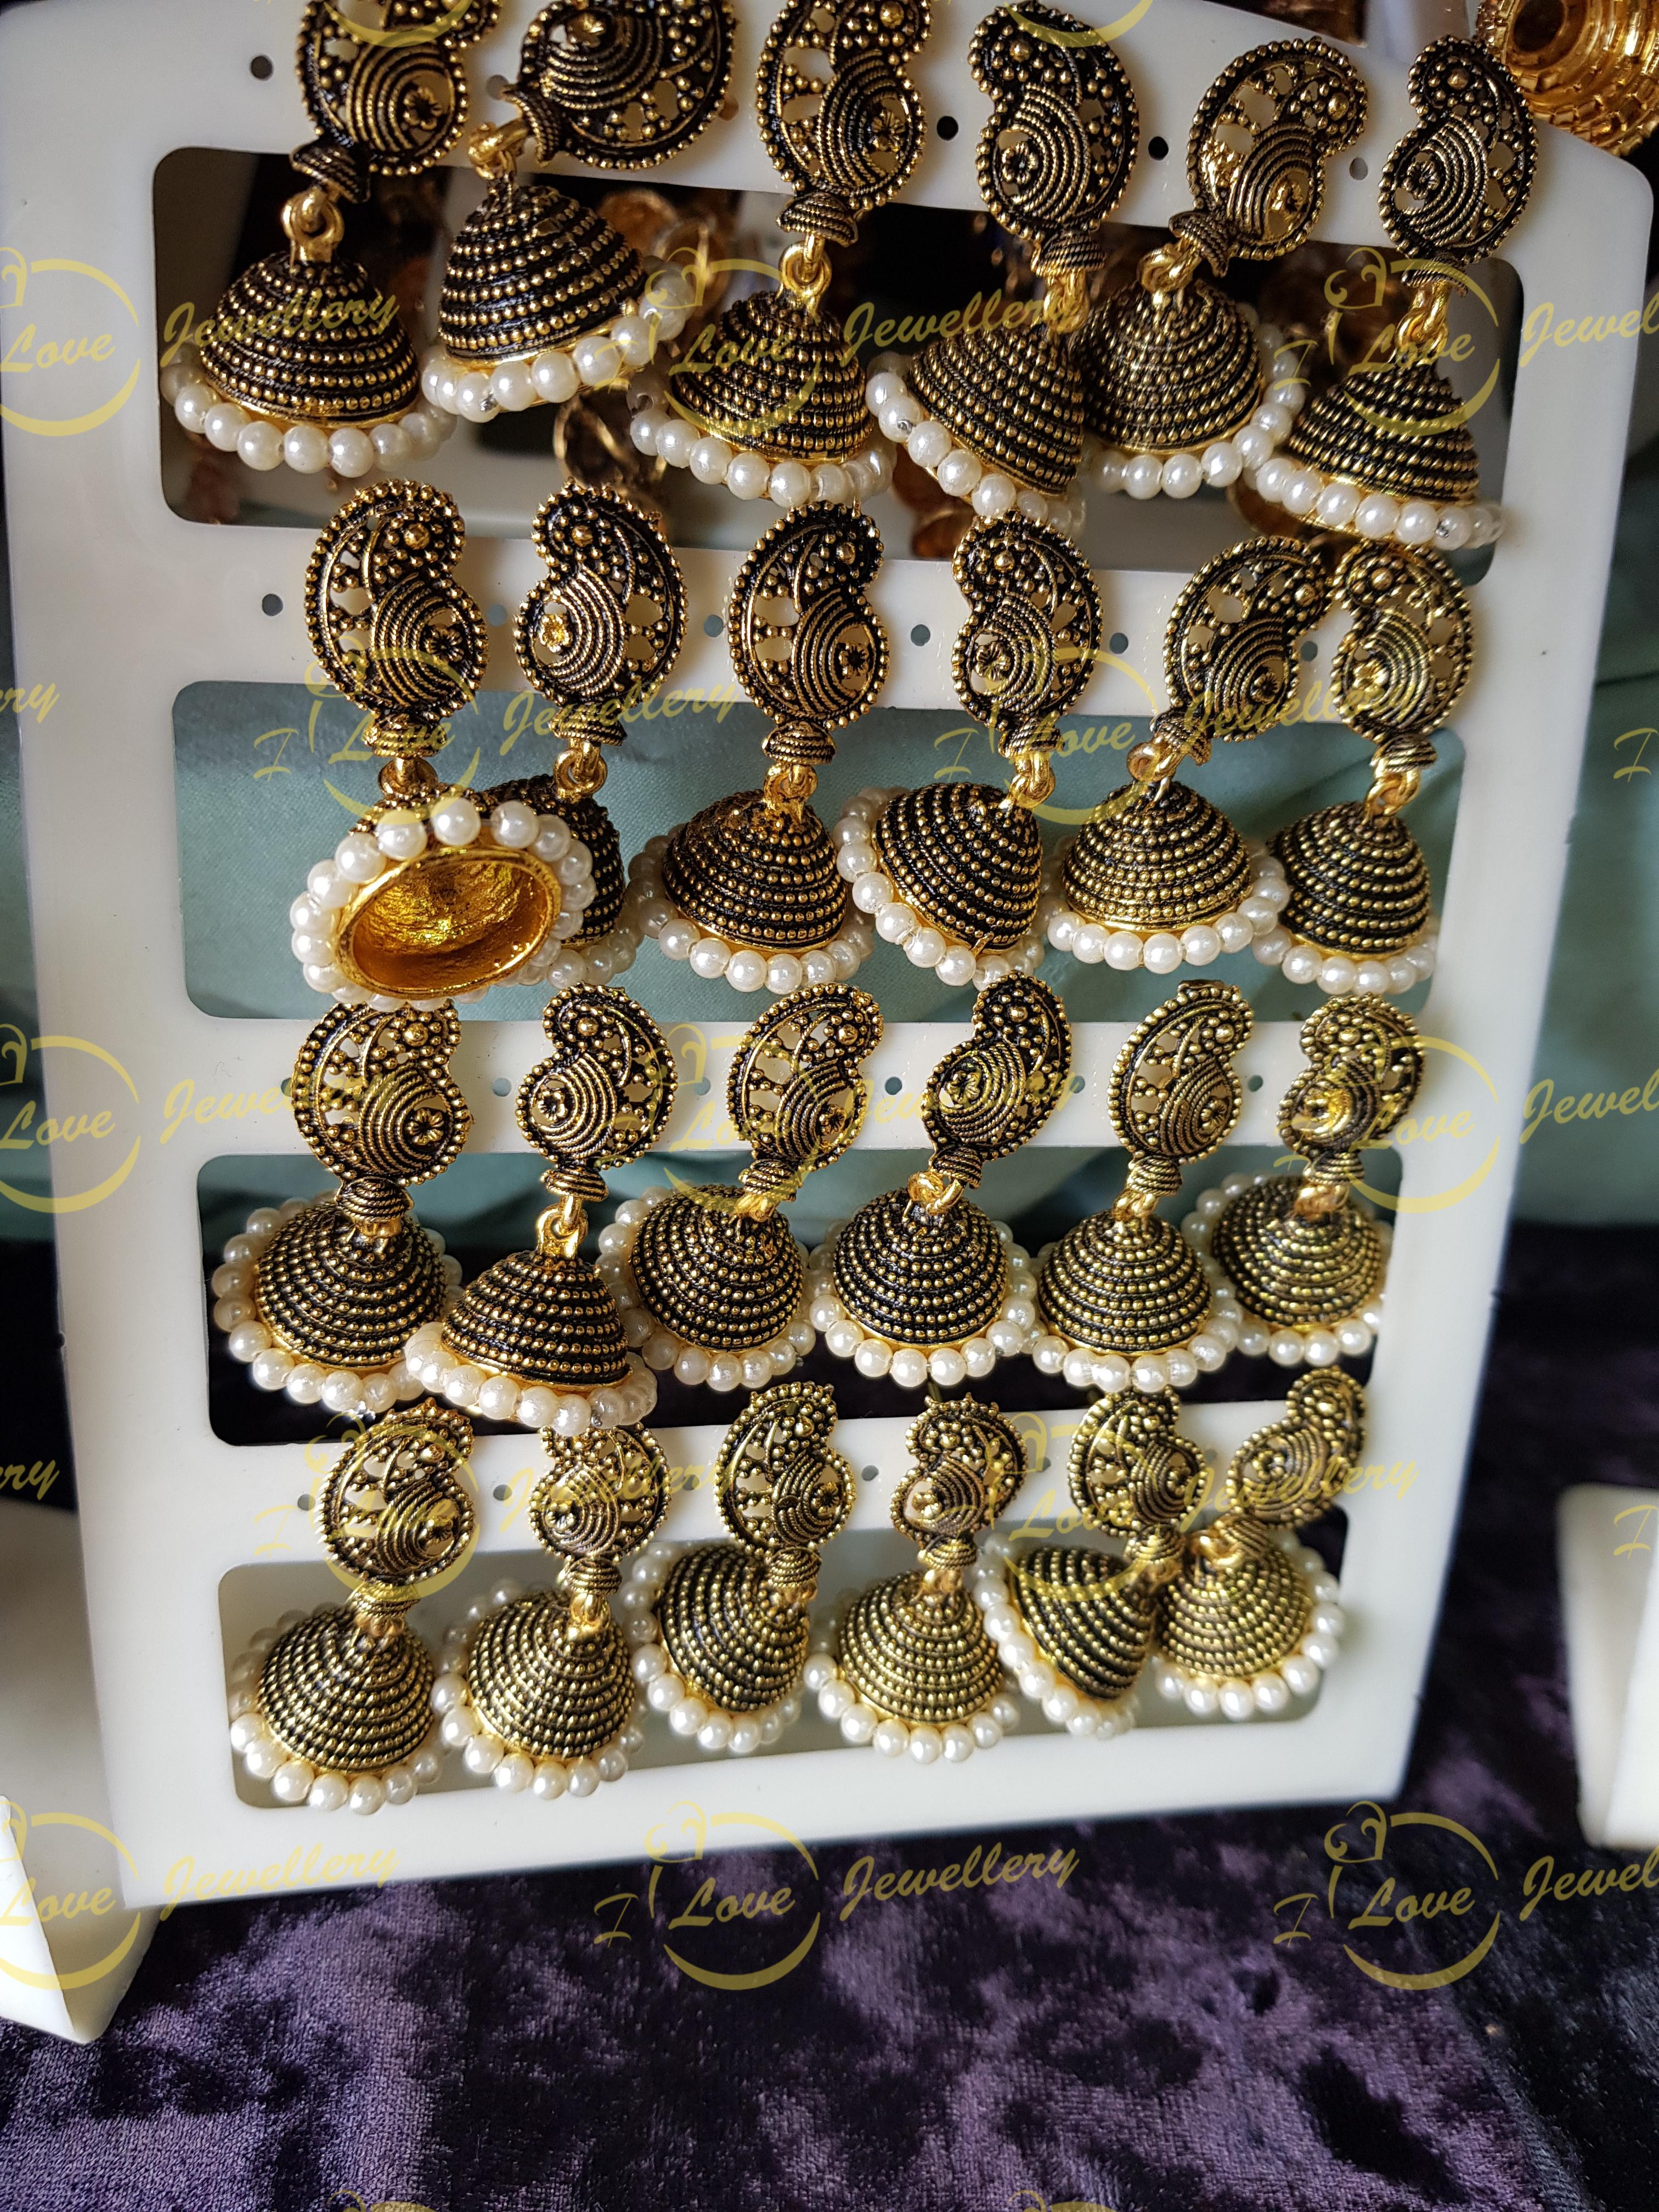 small jhumki earrings - pearl jhumki earrings - wholesale Pakistani jewellery - bespoke Pakistani jewellery